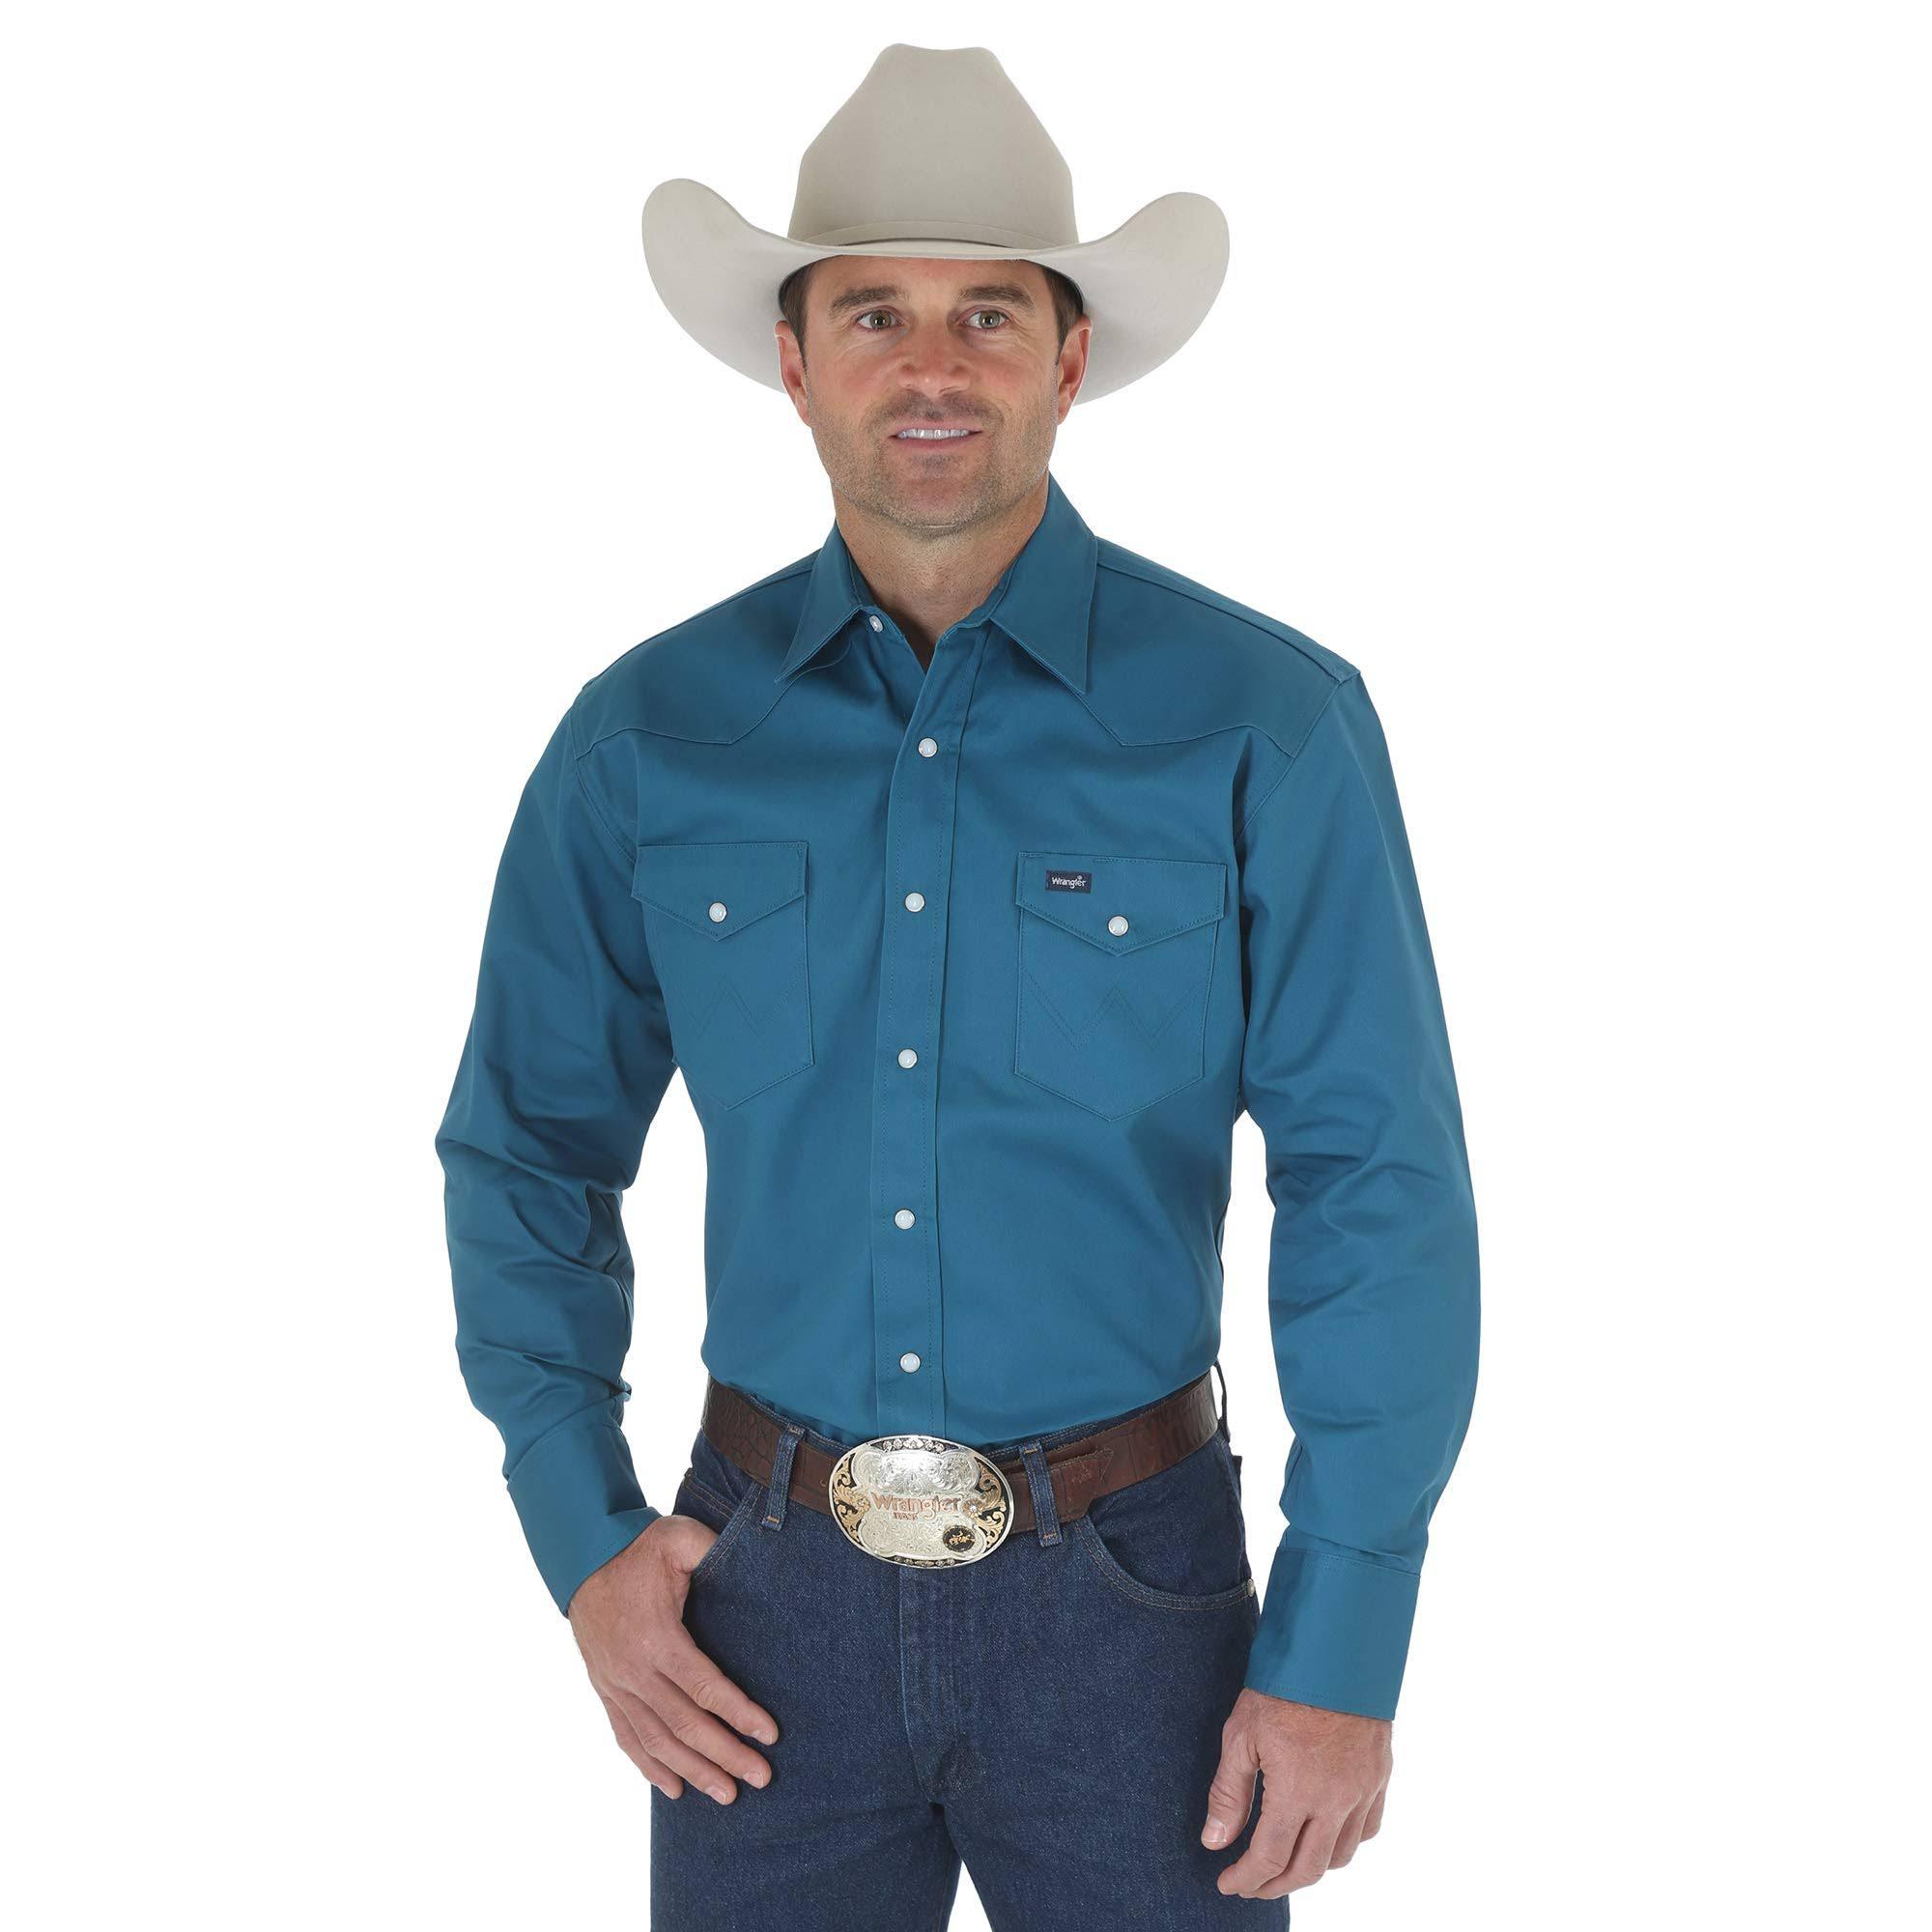 Herren Firm Arbeitshemd Wrangler Langärmliges Cowboy Cut qOqpa